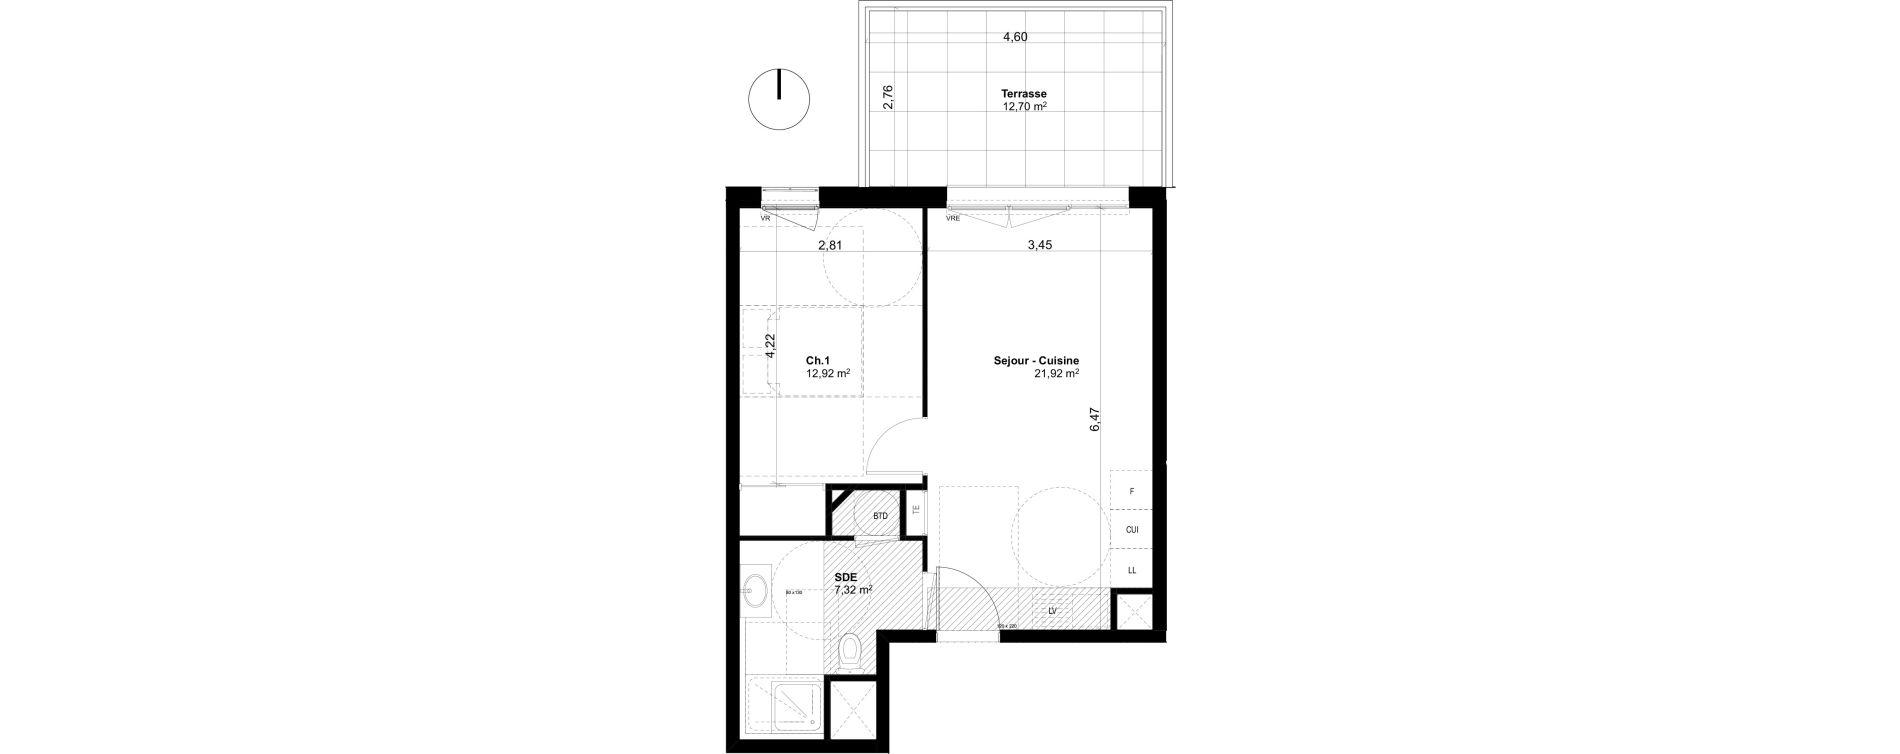 Appartement T2 de 42,16 m2 à Ventabren L heritiere